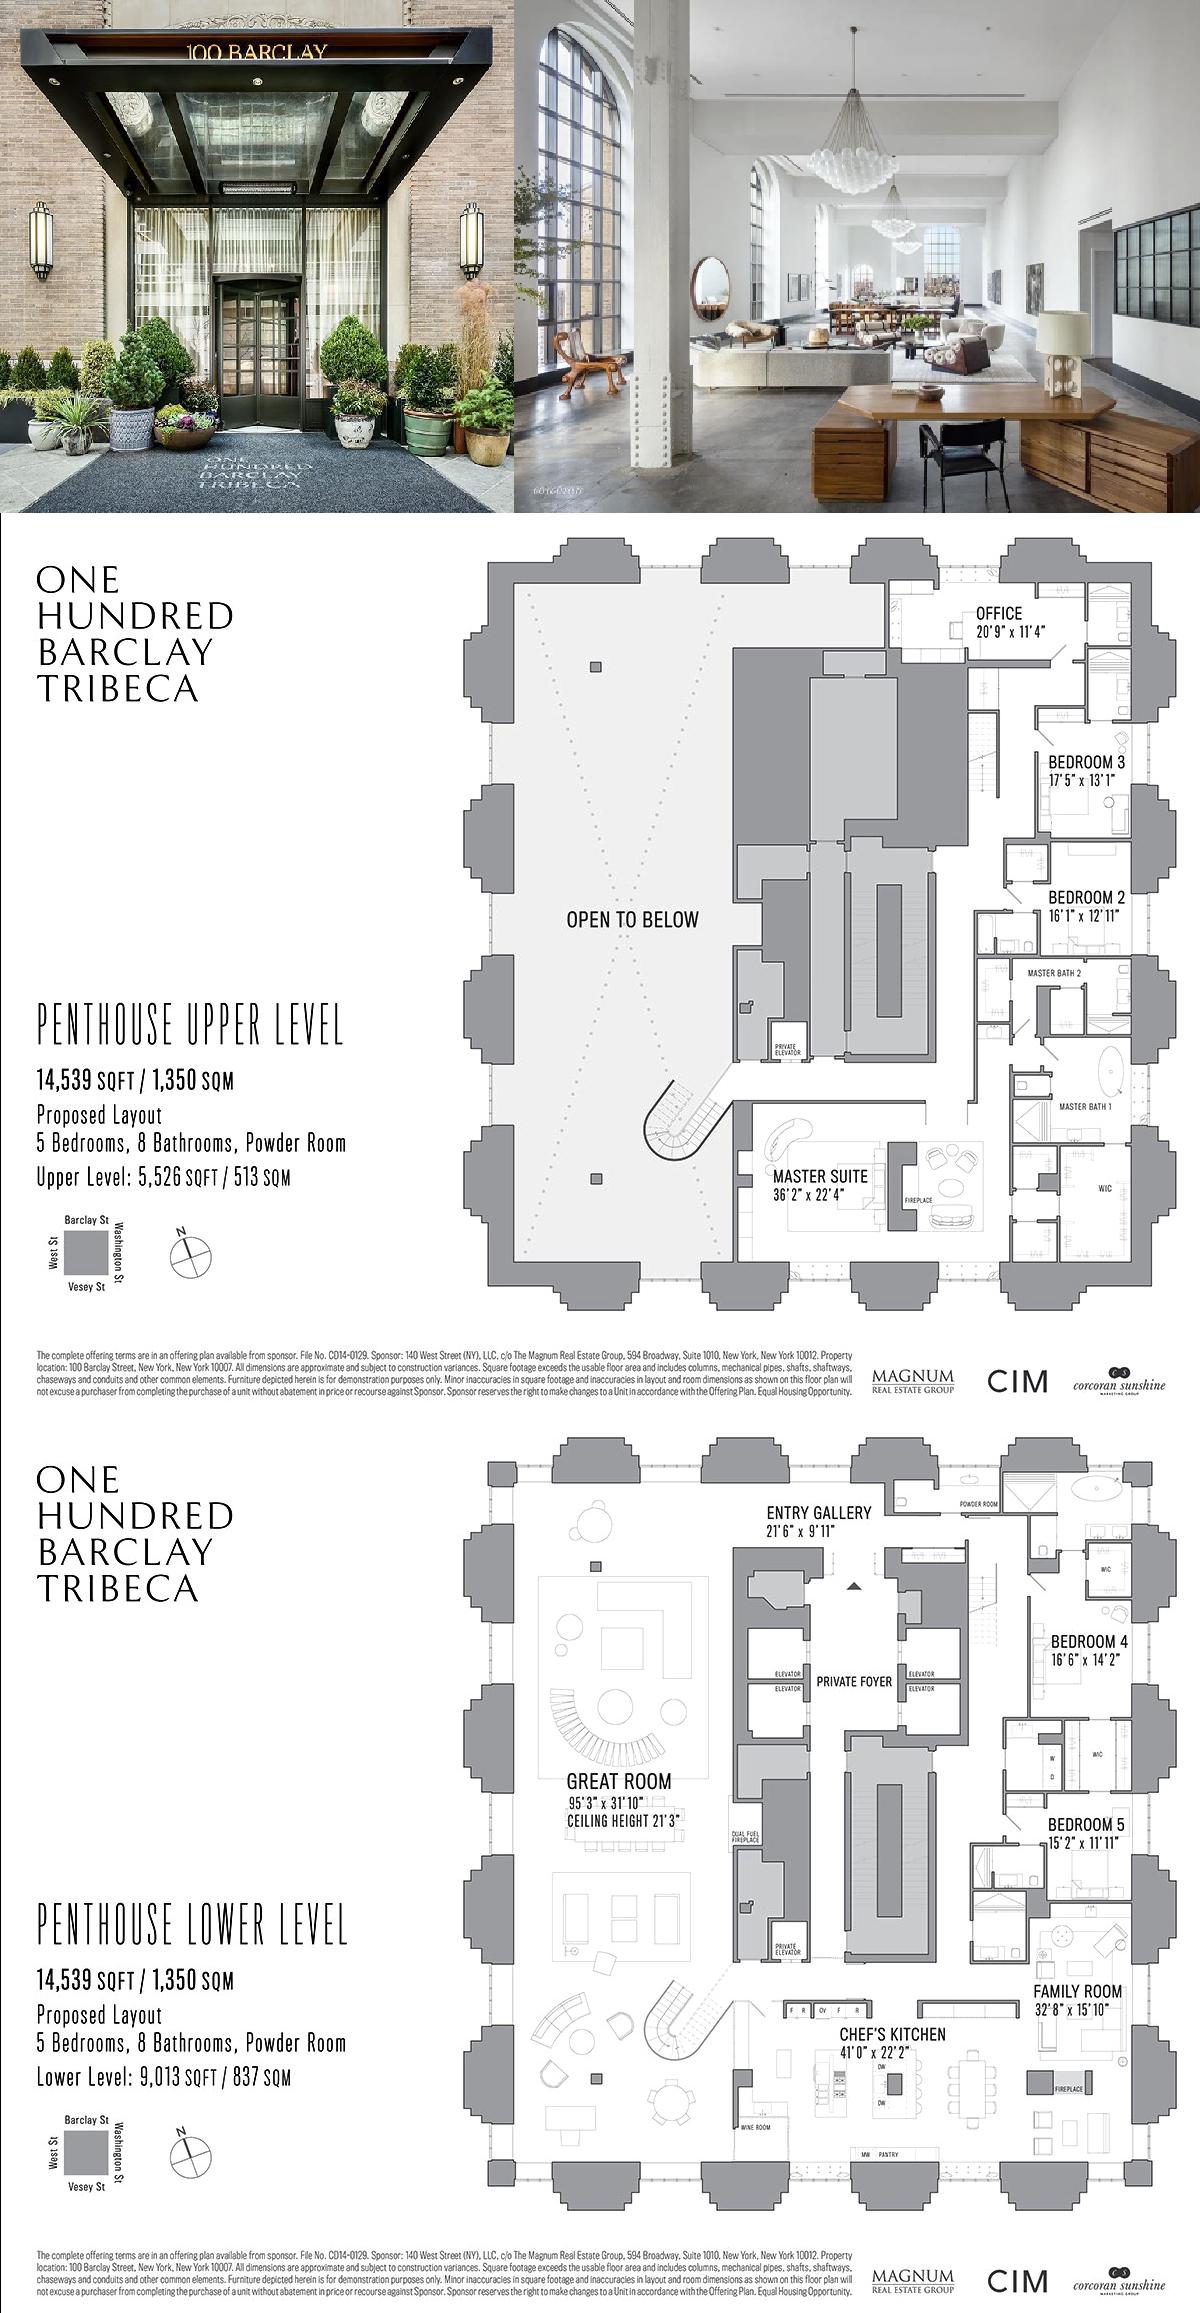 100 Barclay Street Penthouse Penthouse In Tribeca Manhattan Streeteasy Penthouse Apartment Floor Plan Mansion Floor Plan Home Building Design